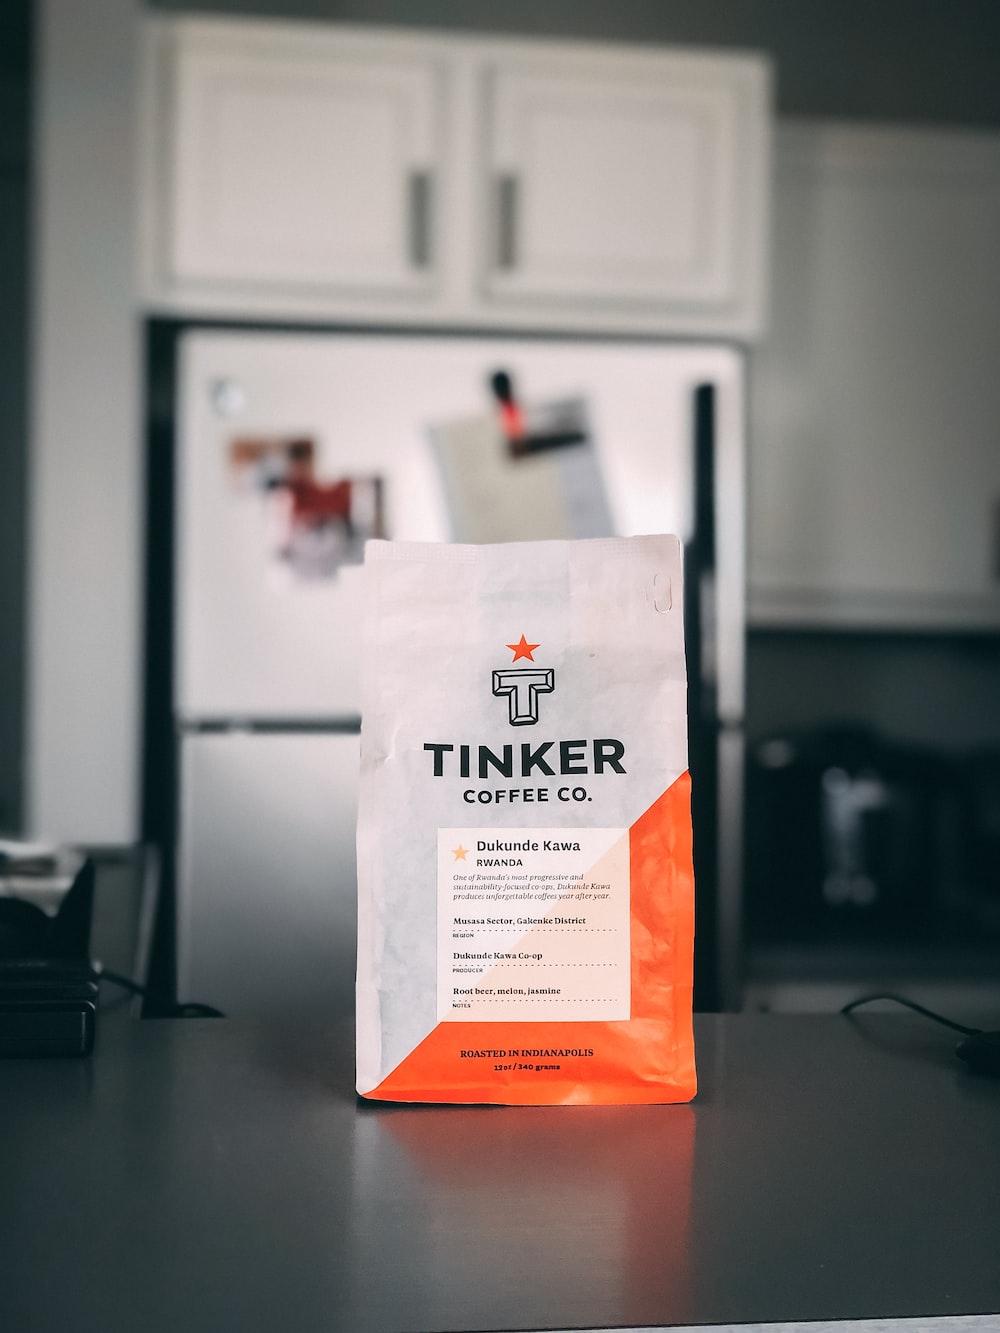 Tinker coffee pack